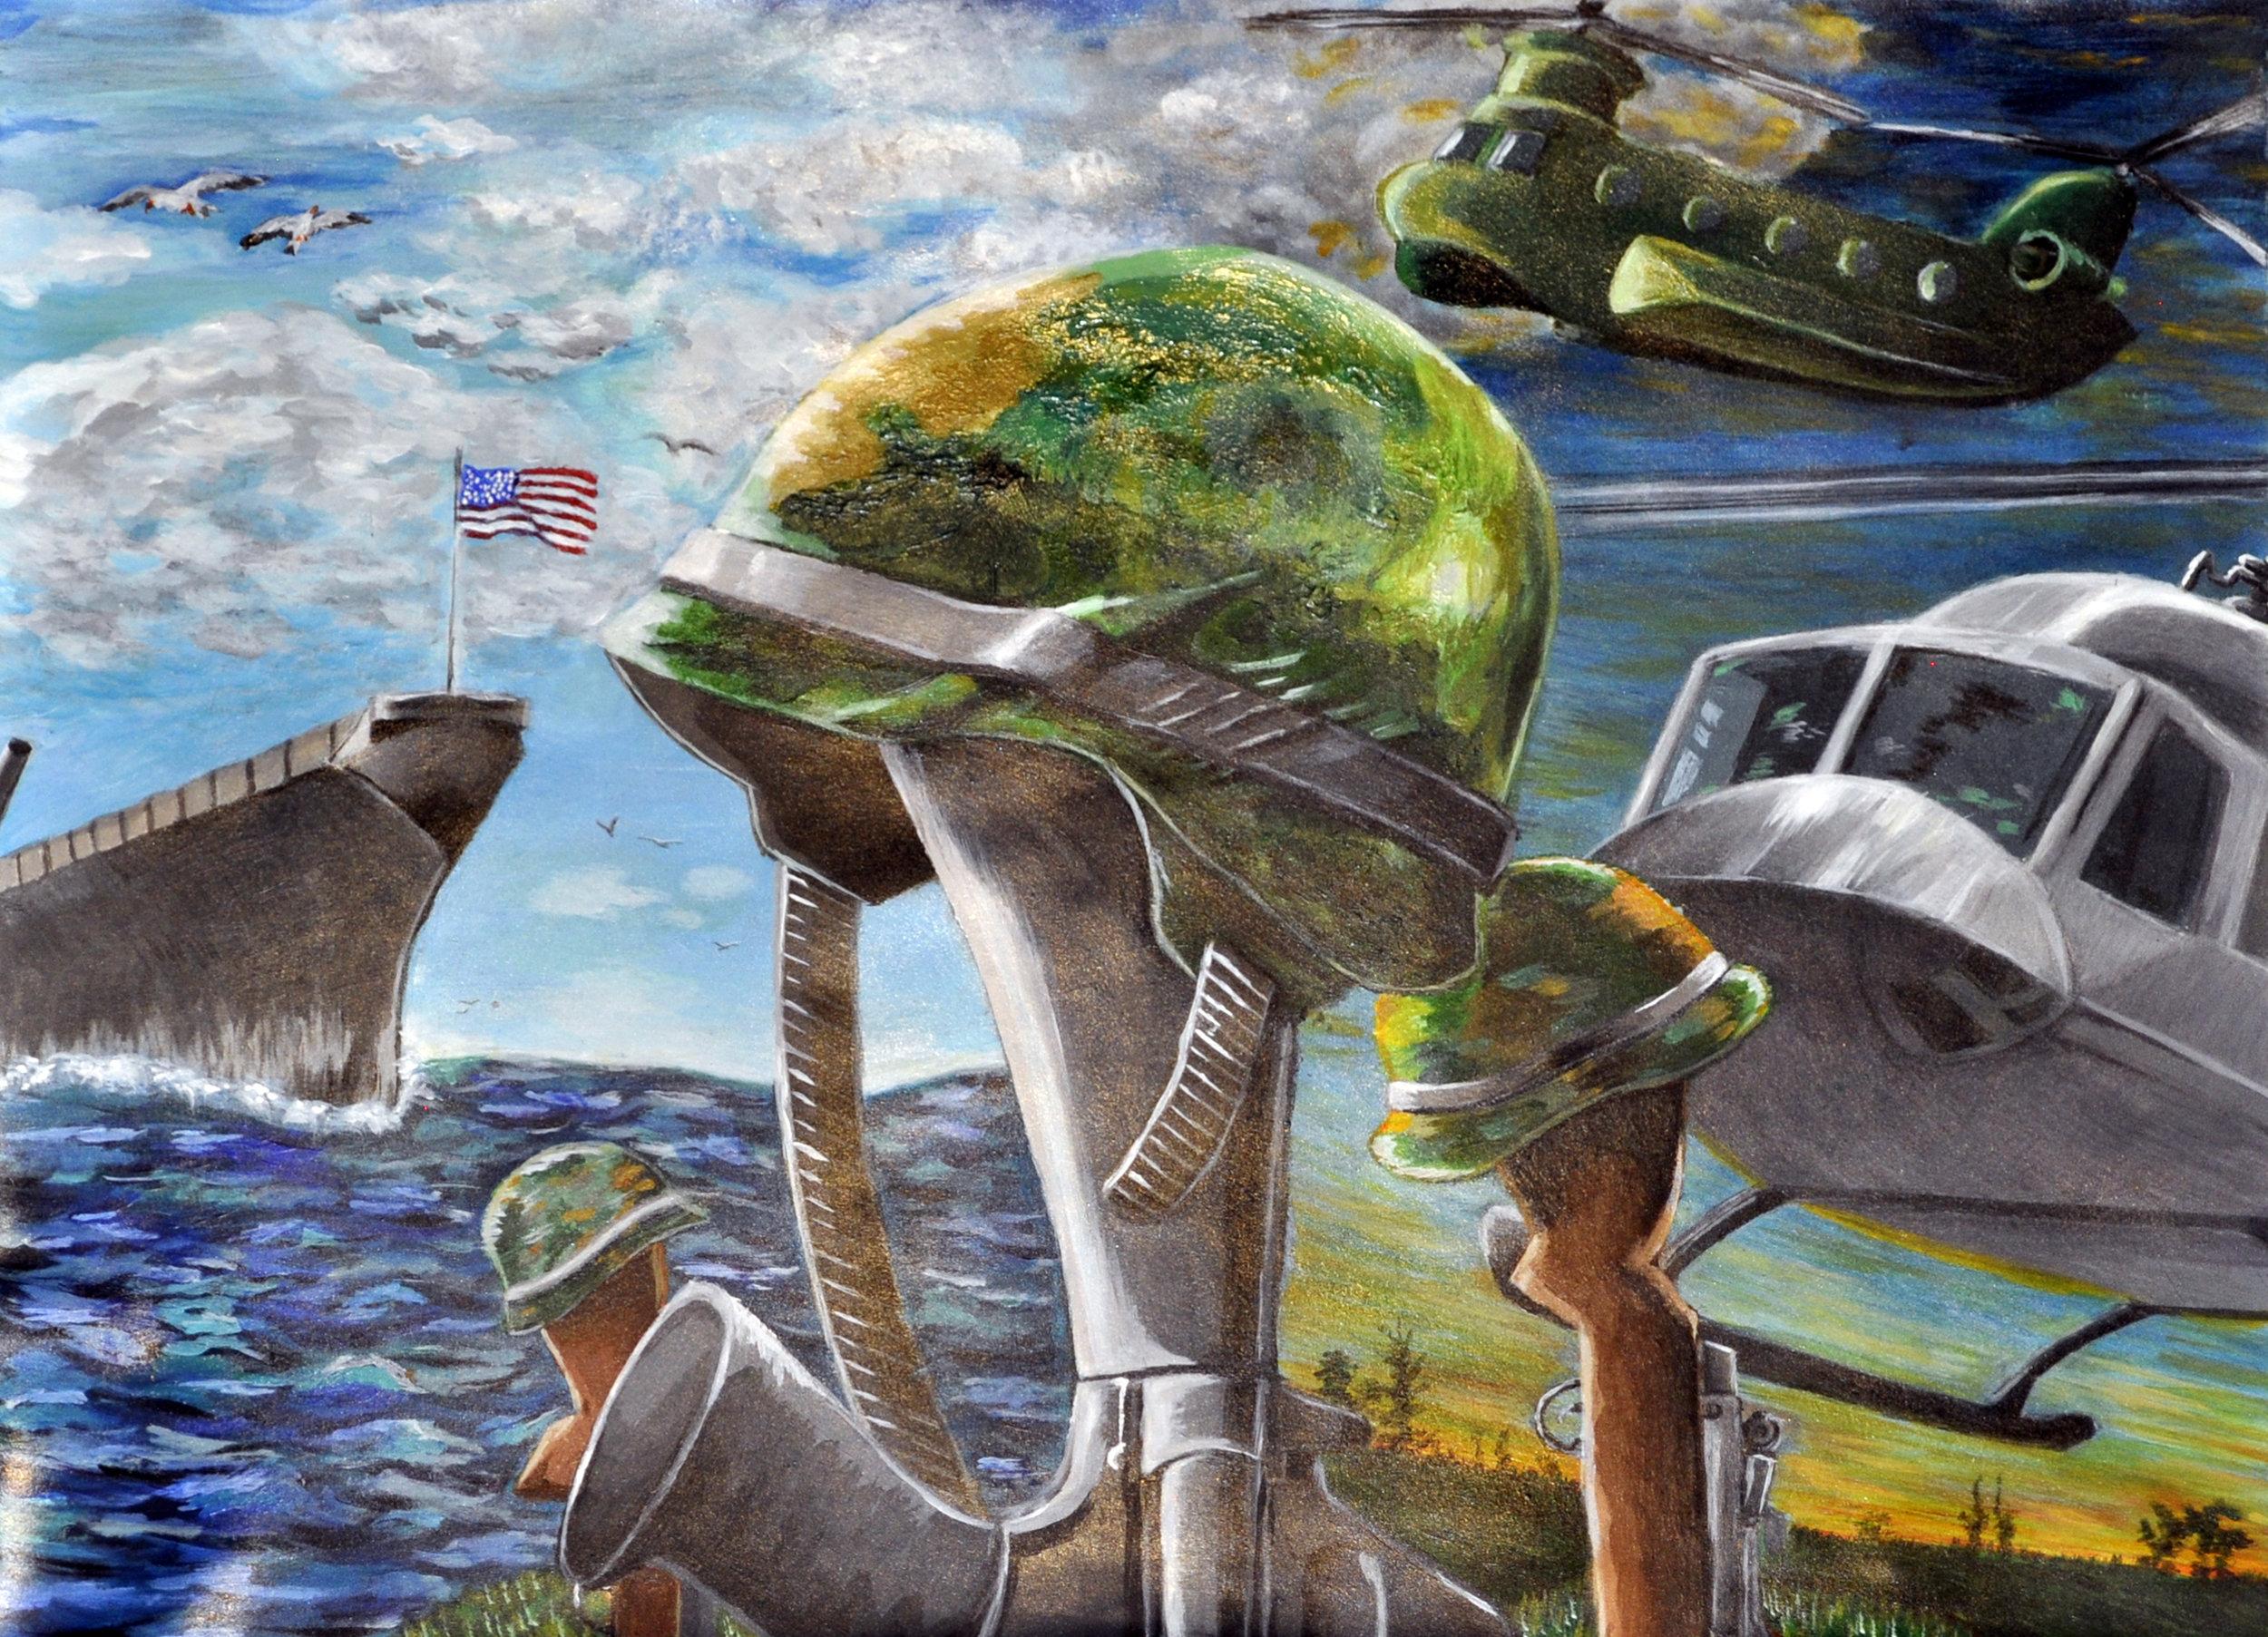 Art by High School student Lee Andrews